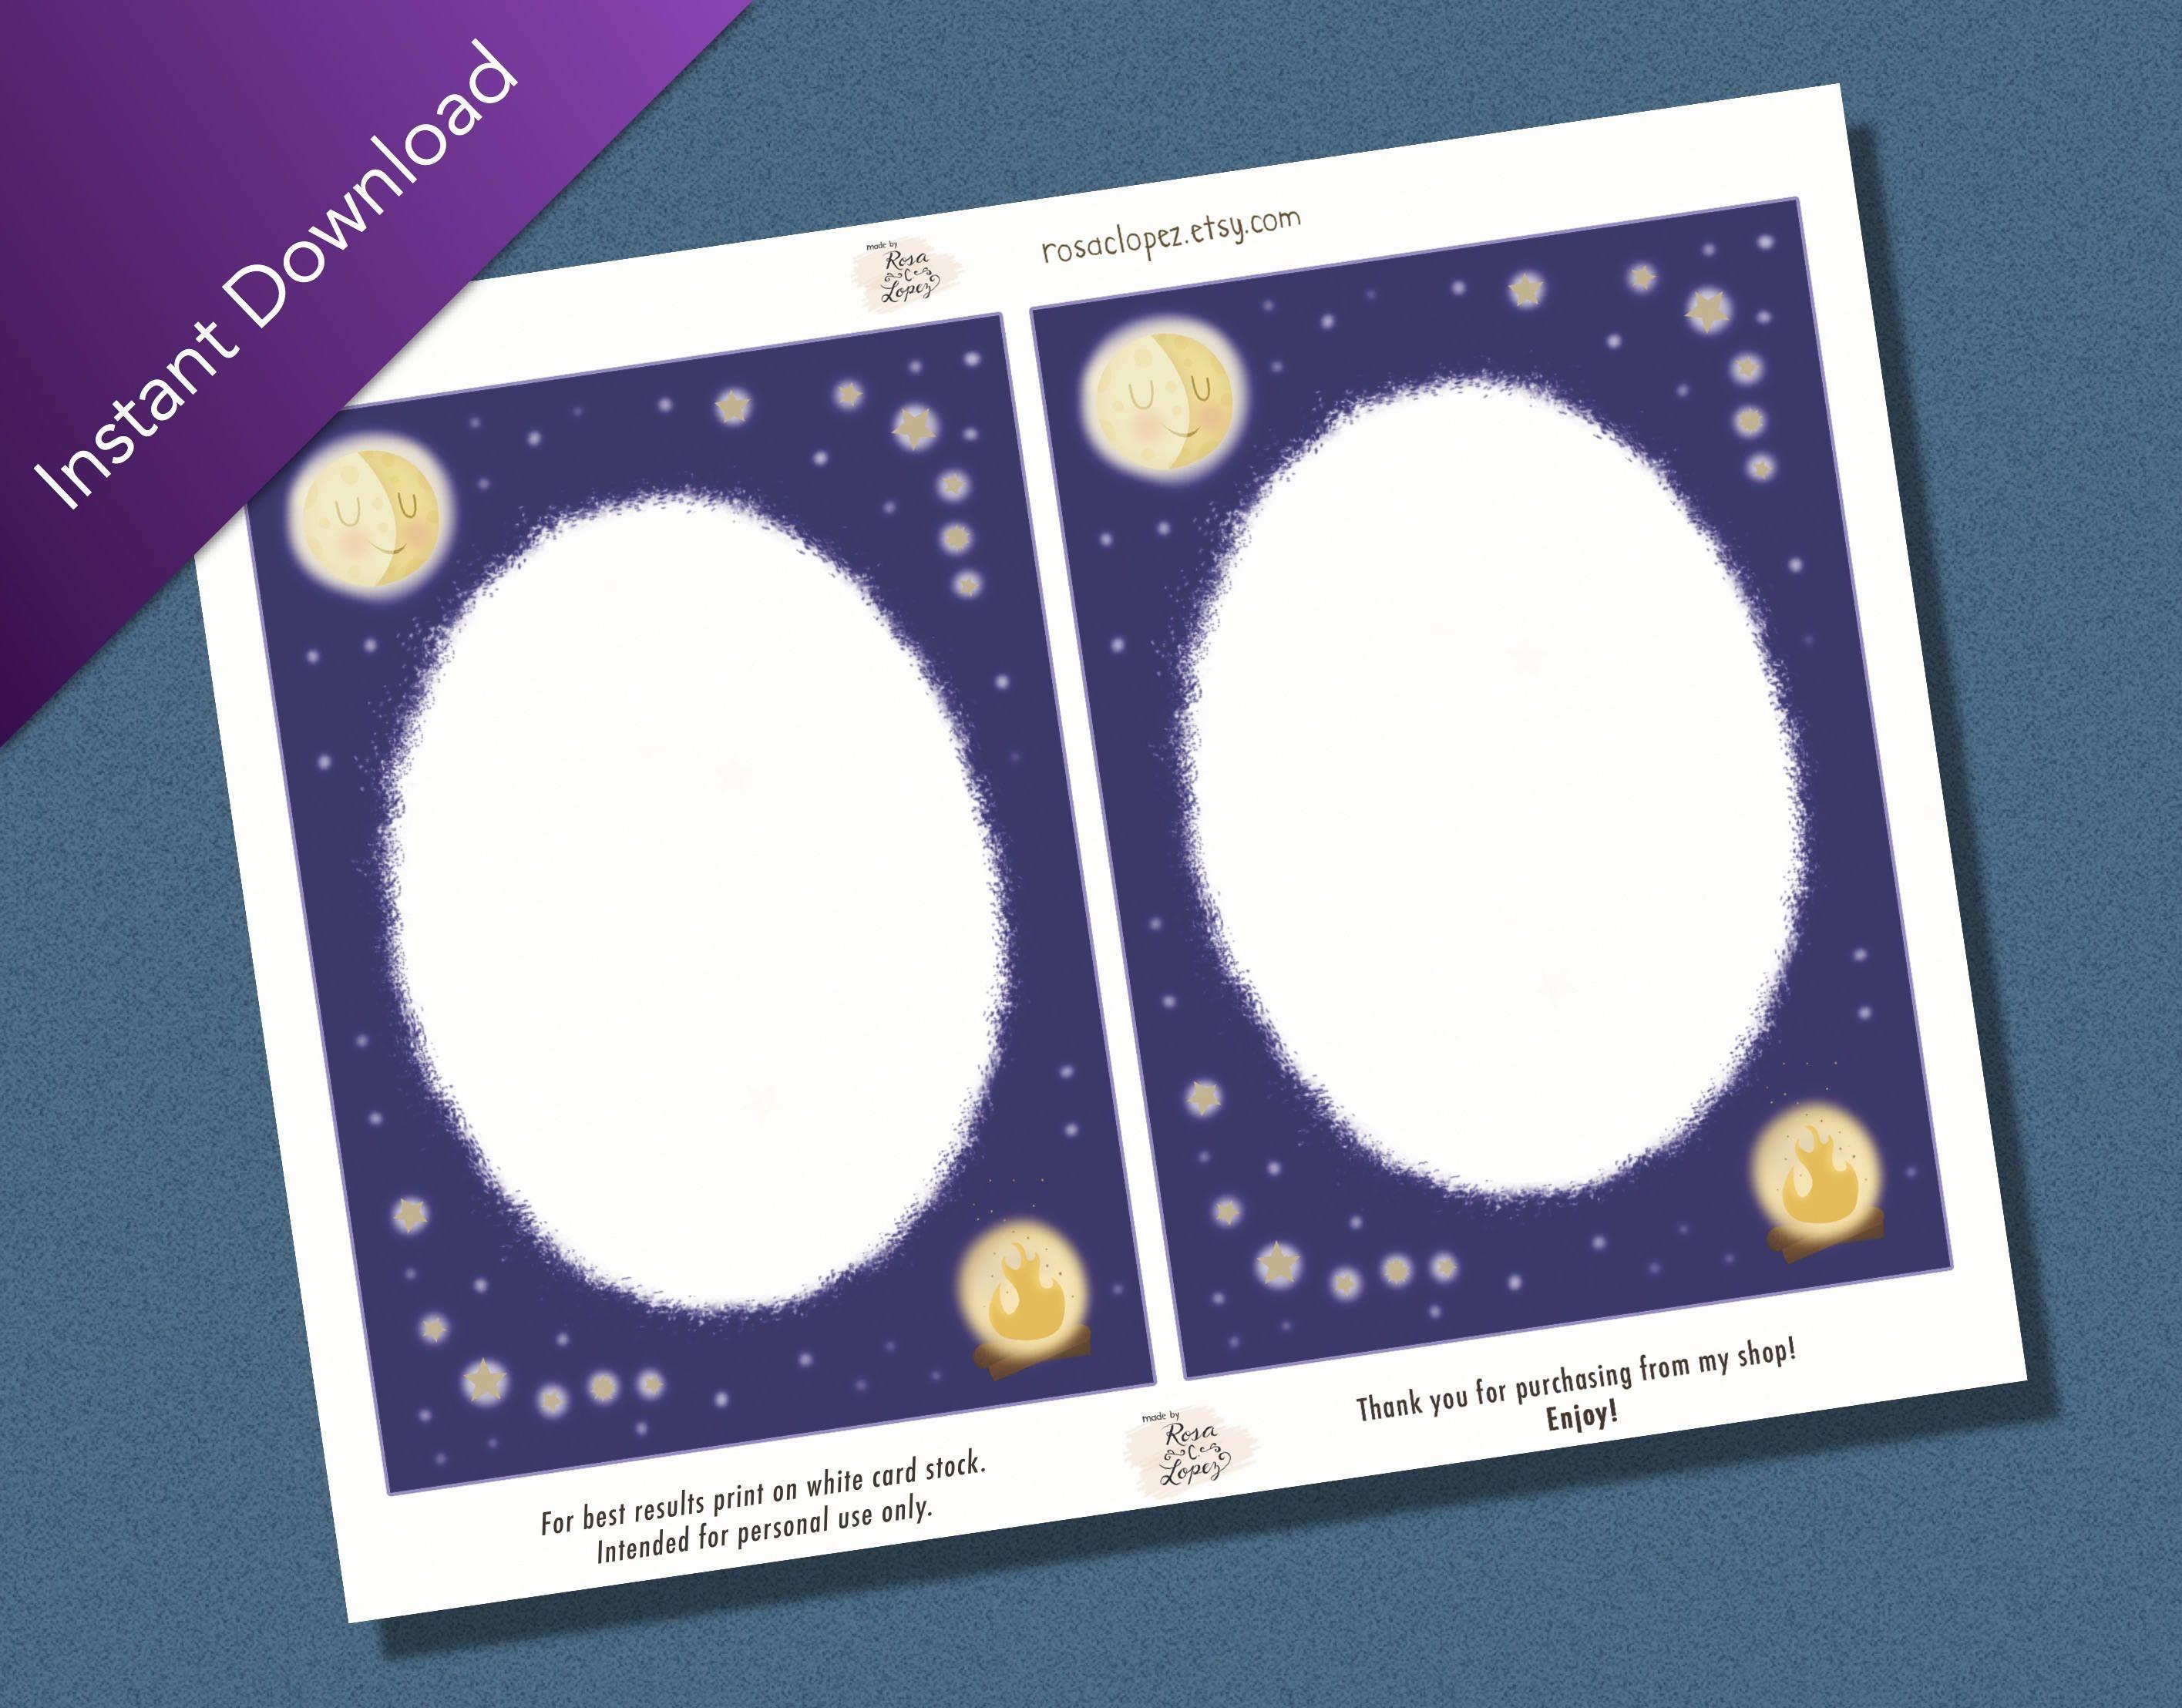 Superbe DIGITAL DOWNLOAD  Summer Scrapbook Notecards, Summer Nights Notes, 8.5 X 11  Sized Sheet